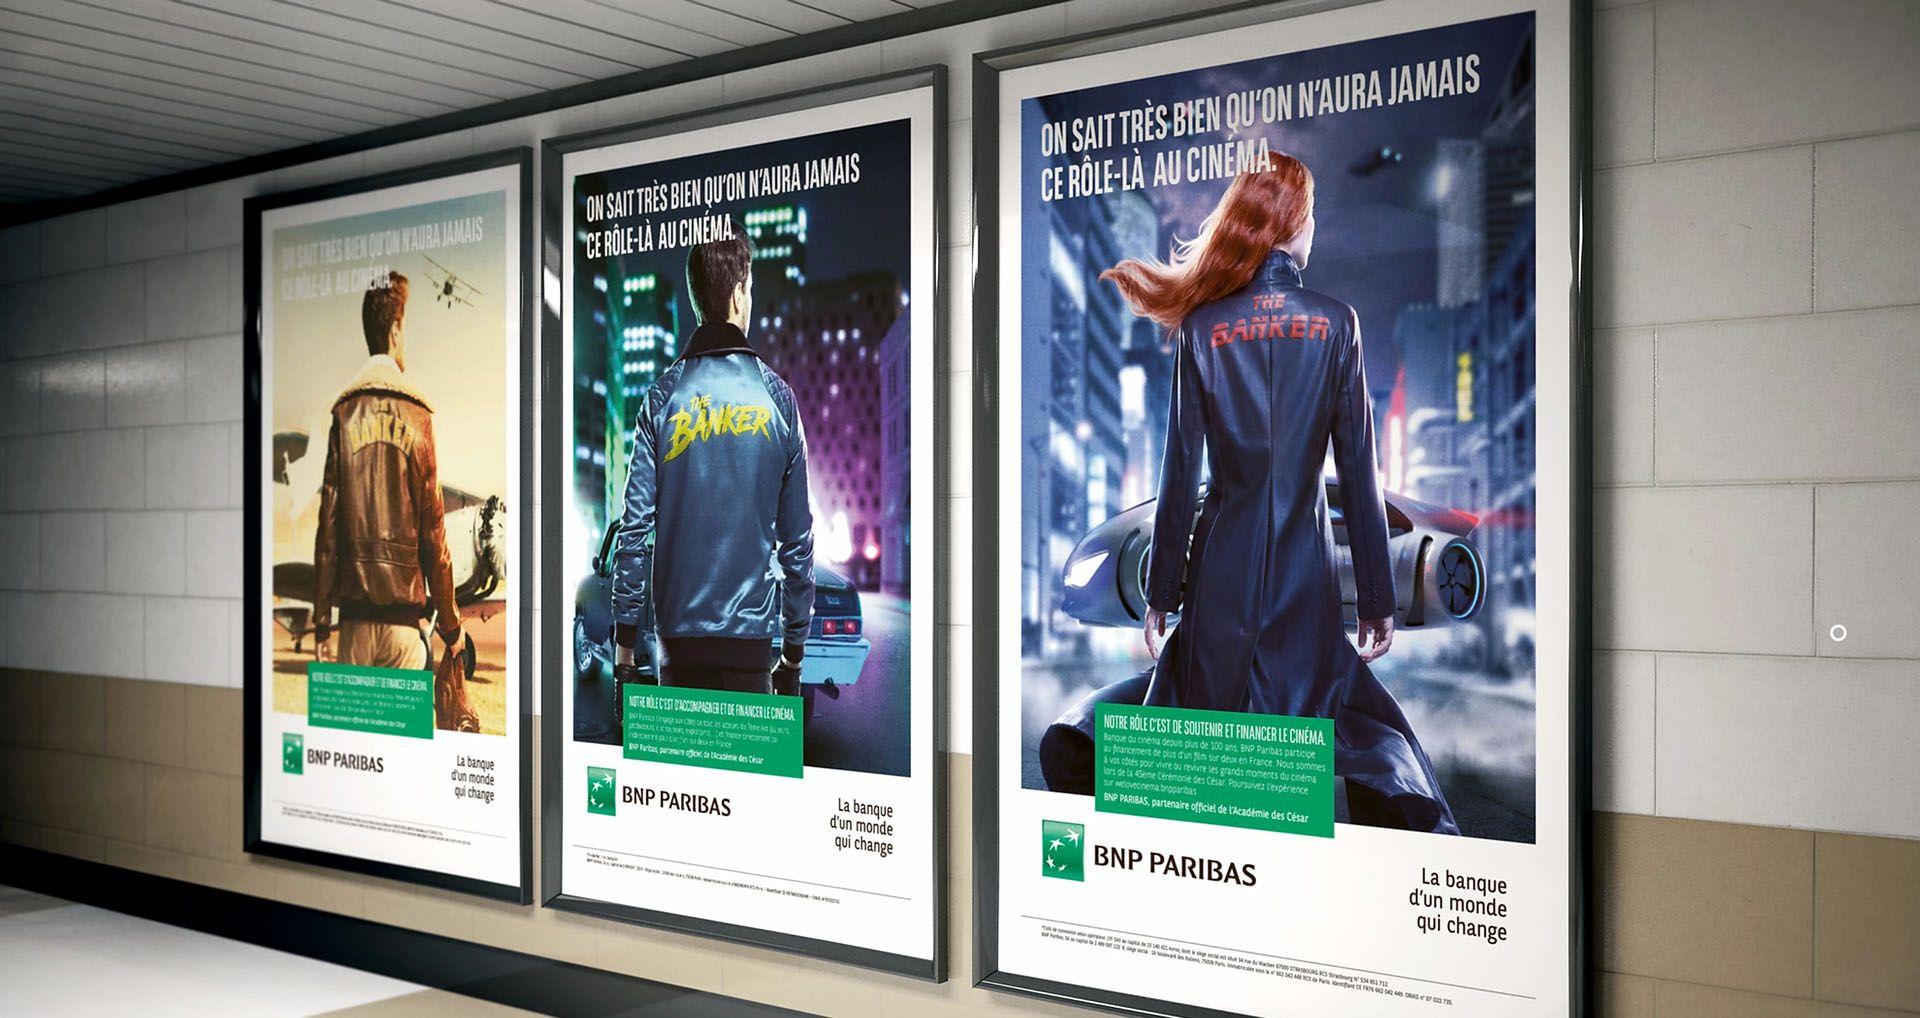 mockup of posters by Simon Duhamel for bank BNP Paribas